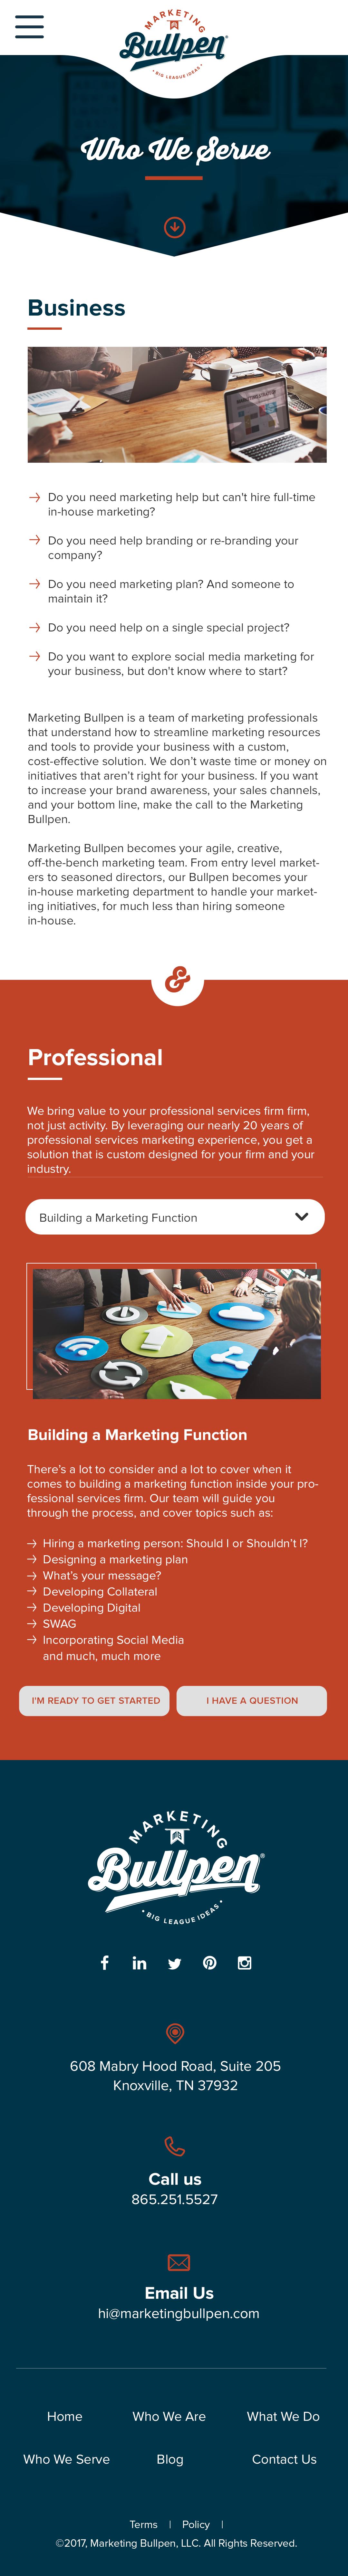 Marketing Bullpen - Interior Website Pages Design